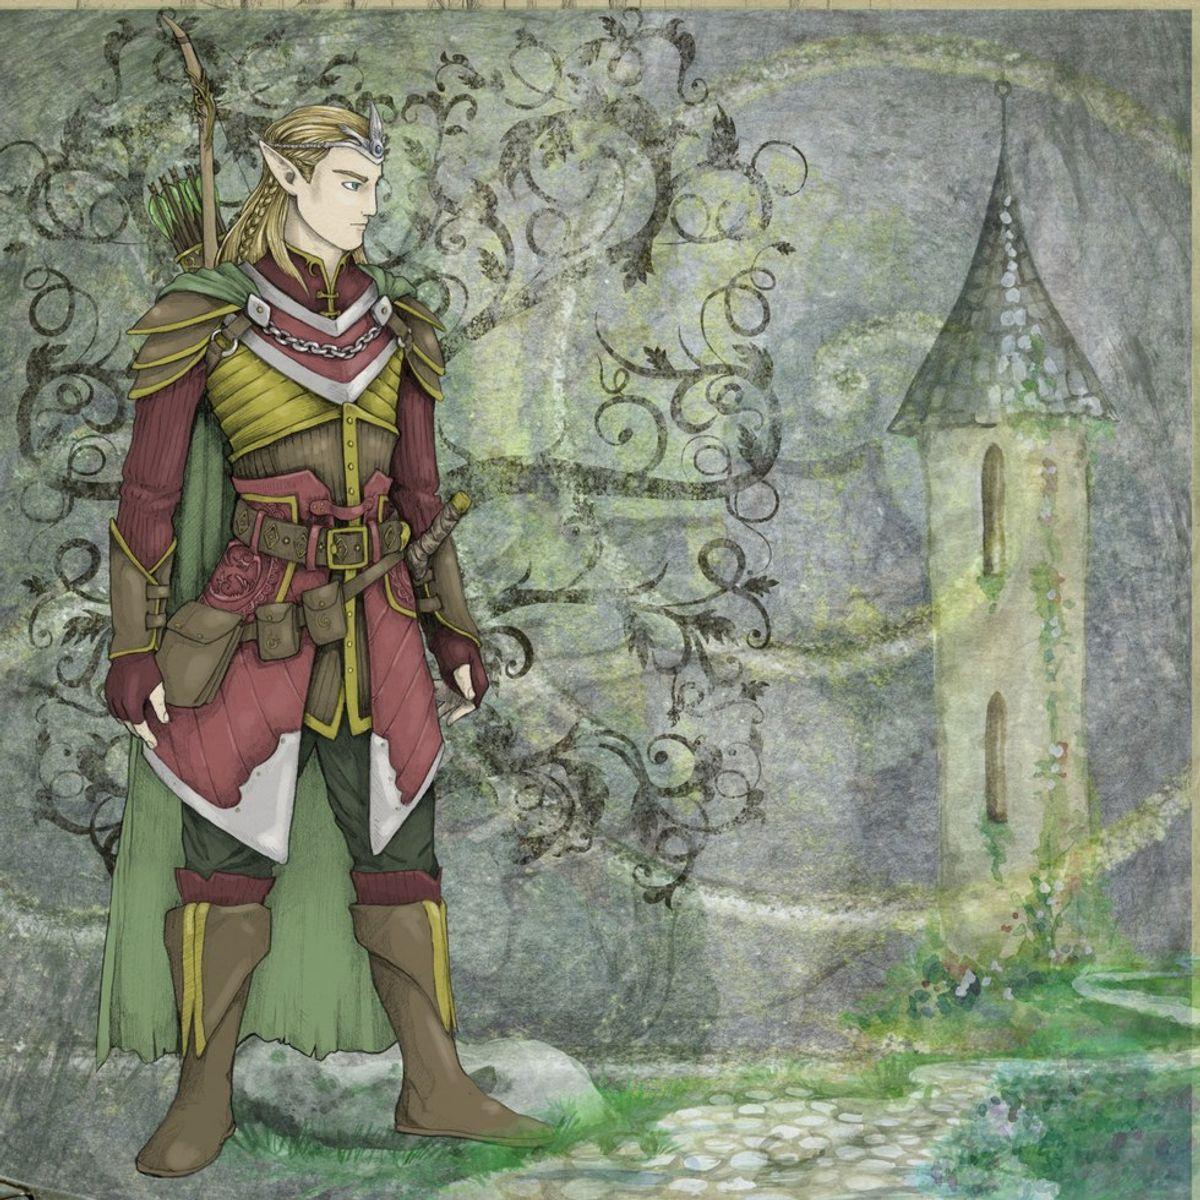 Swords, Sci-fi, and Sanic